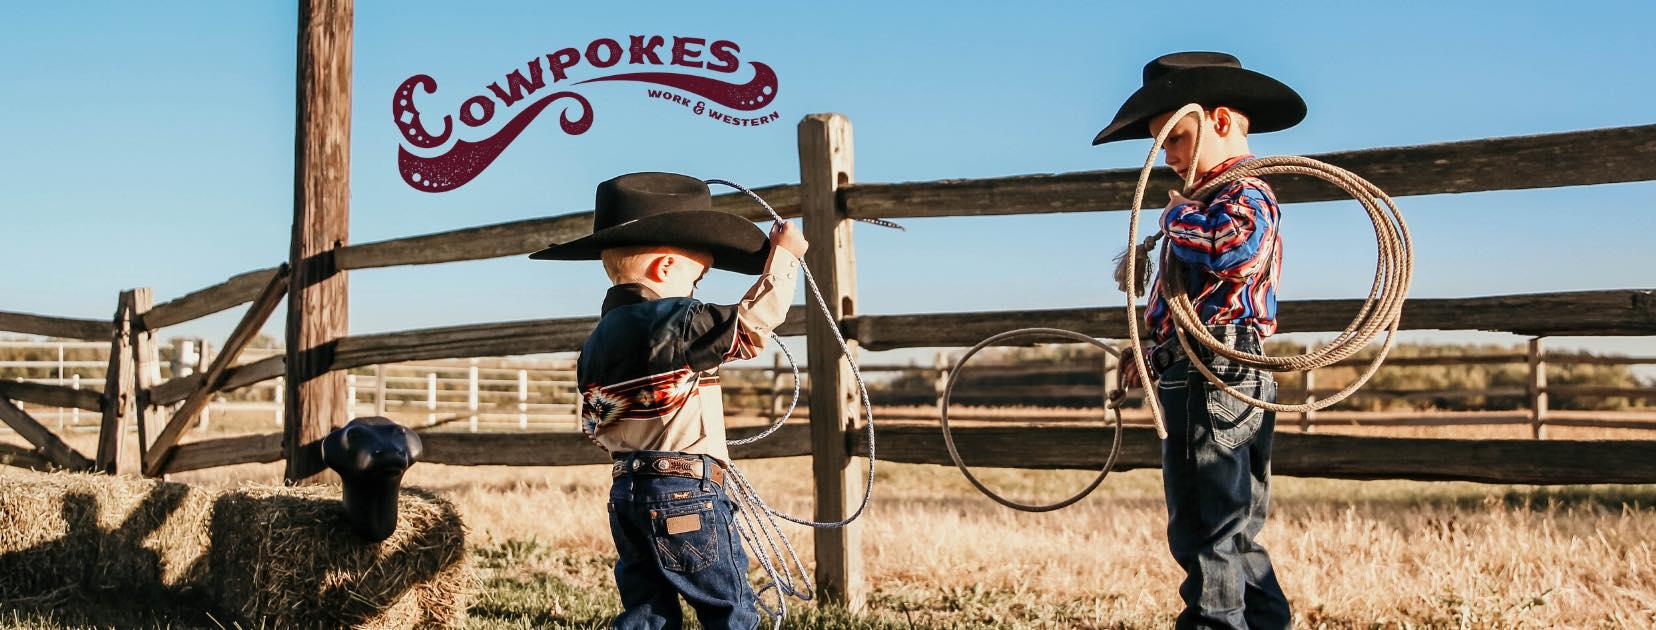 Cowpokes Work & Western in Anderson